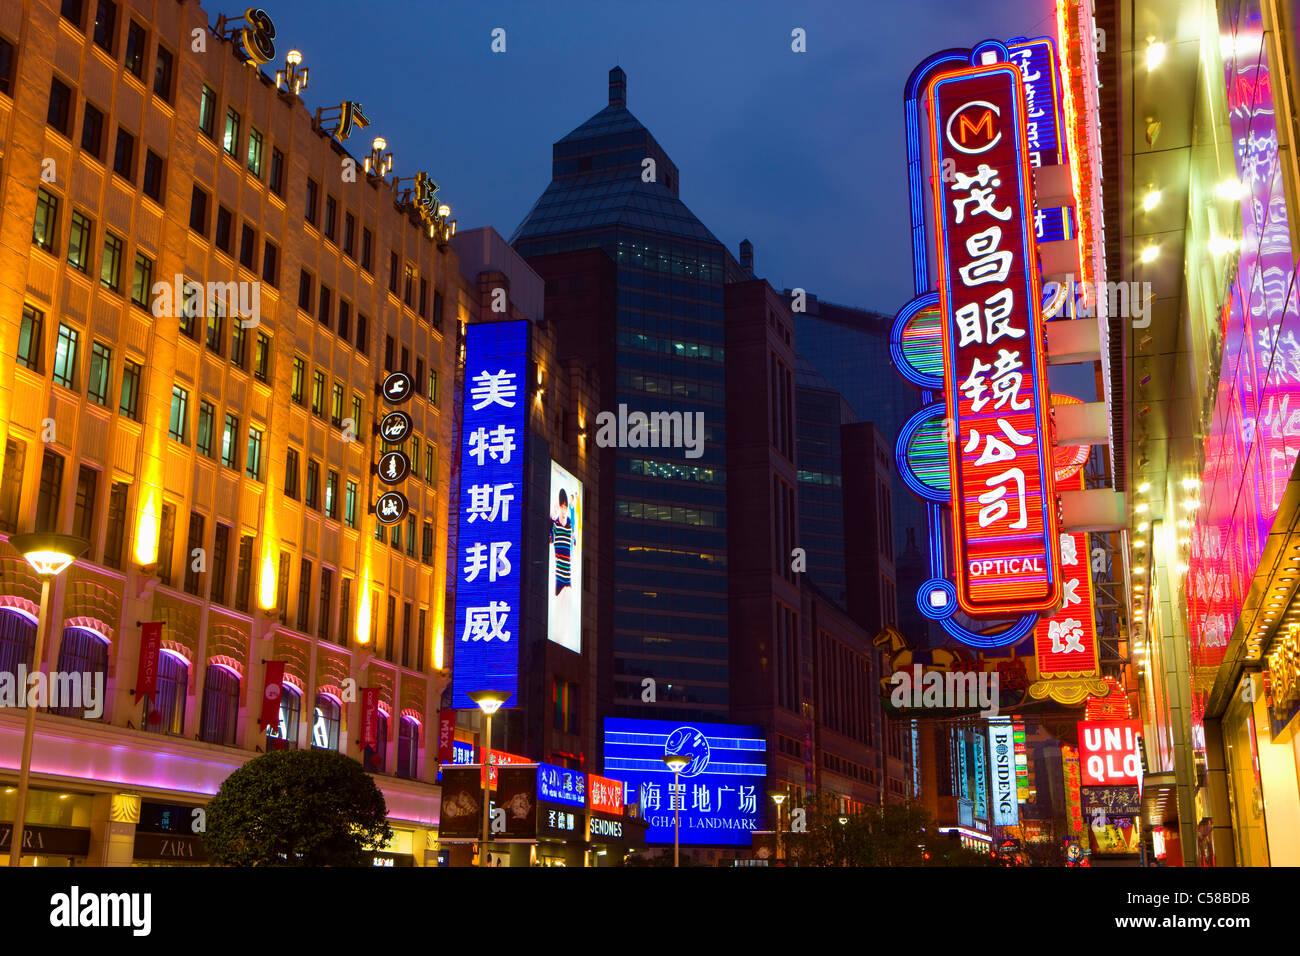 Shanghai, China, Asia, city, b, s of flats, high-rise buildings, pedestrian precinct, mall, shopping street, shops, - Stock Image